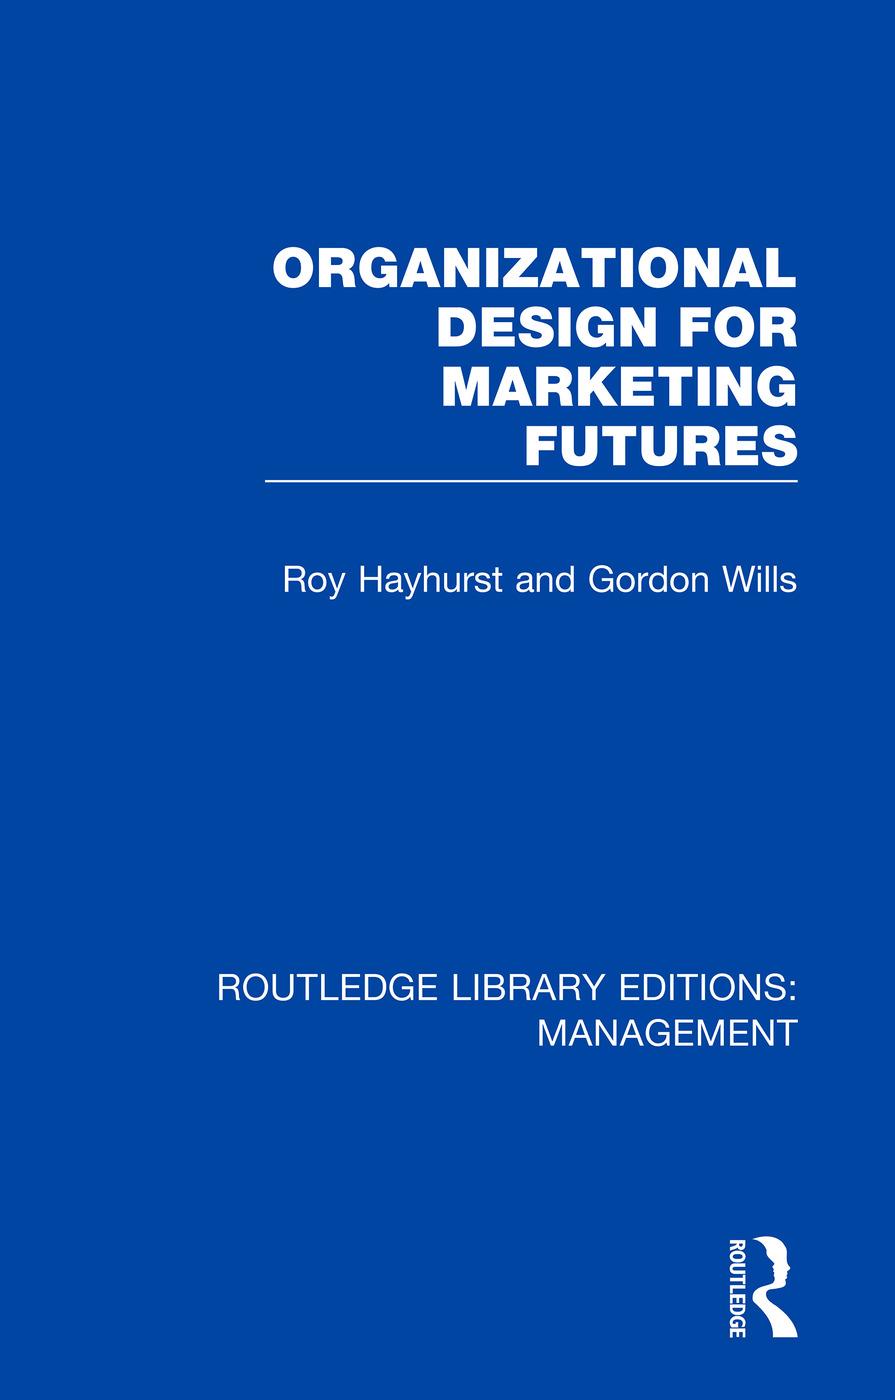 Organizational Design for Marketing Futures